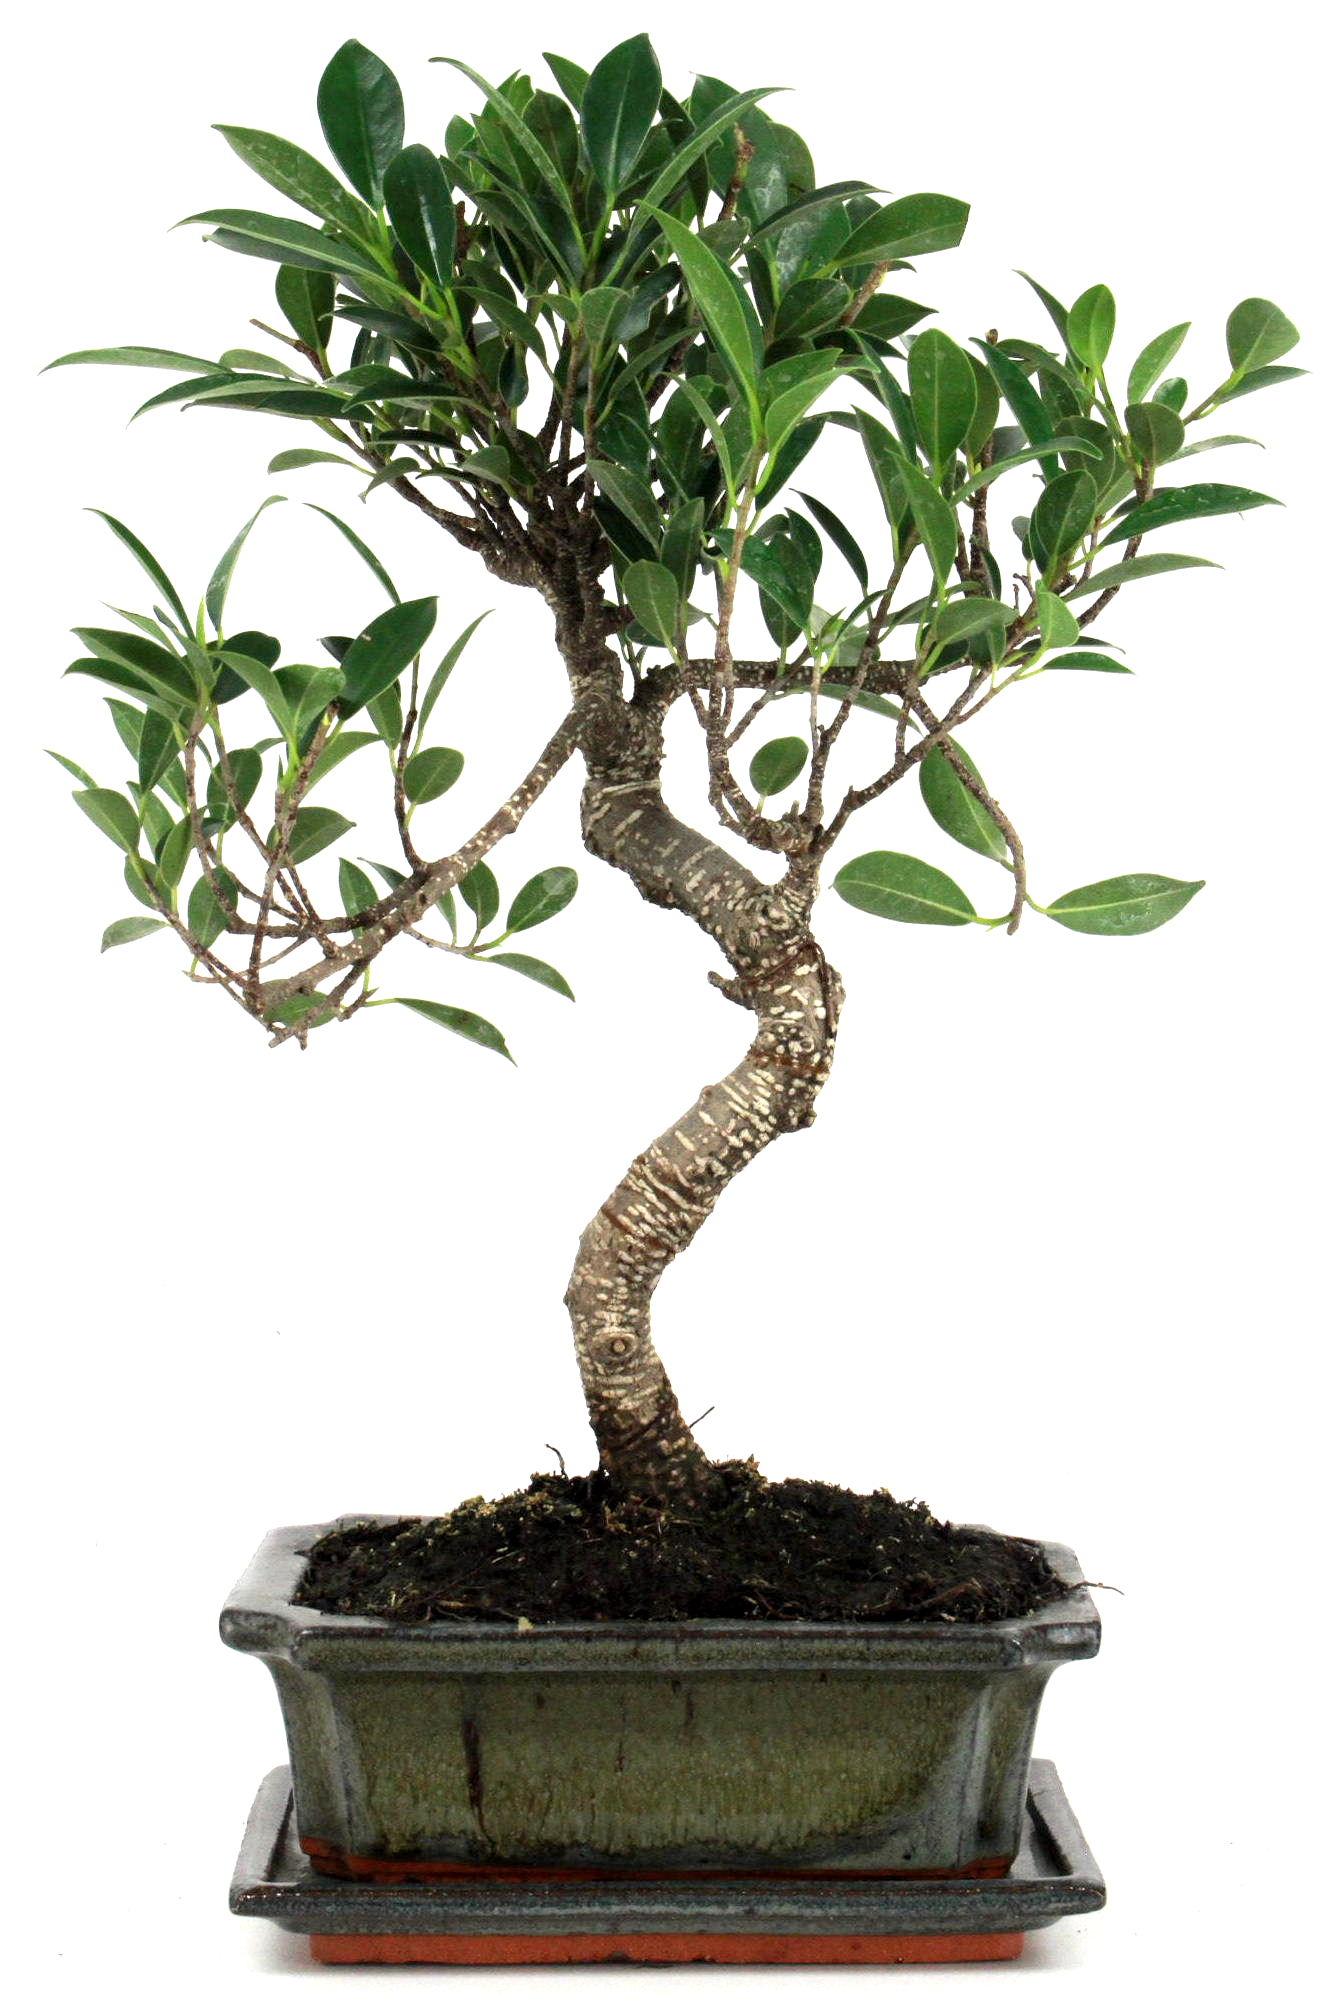 chinesische feige ficus bonsai 35 40 cm 1913 bei oyaki. Black Bedroom Furniture Sets. Home Design Ideas